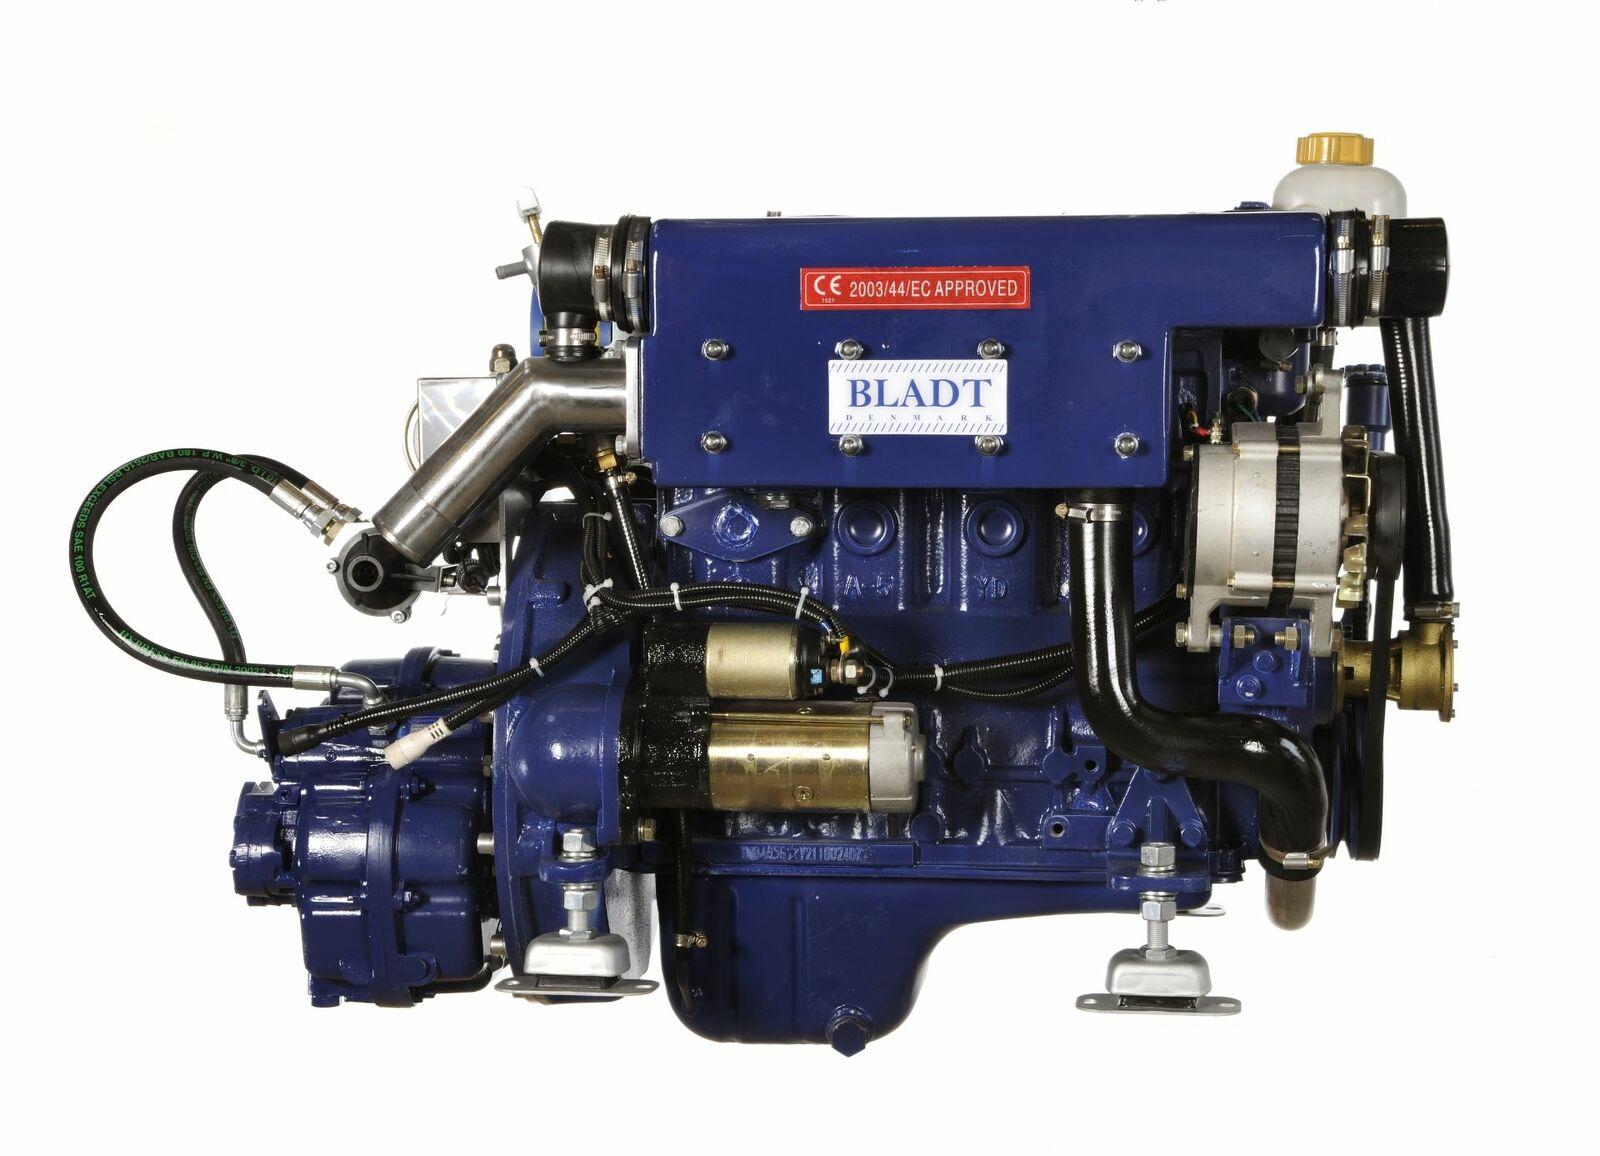 Bladt Diesel 37 PS Innenbordmotor (Segelboot / Motorboot Gleiter / Verdränger)